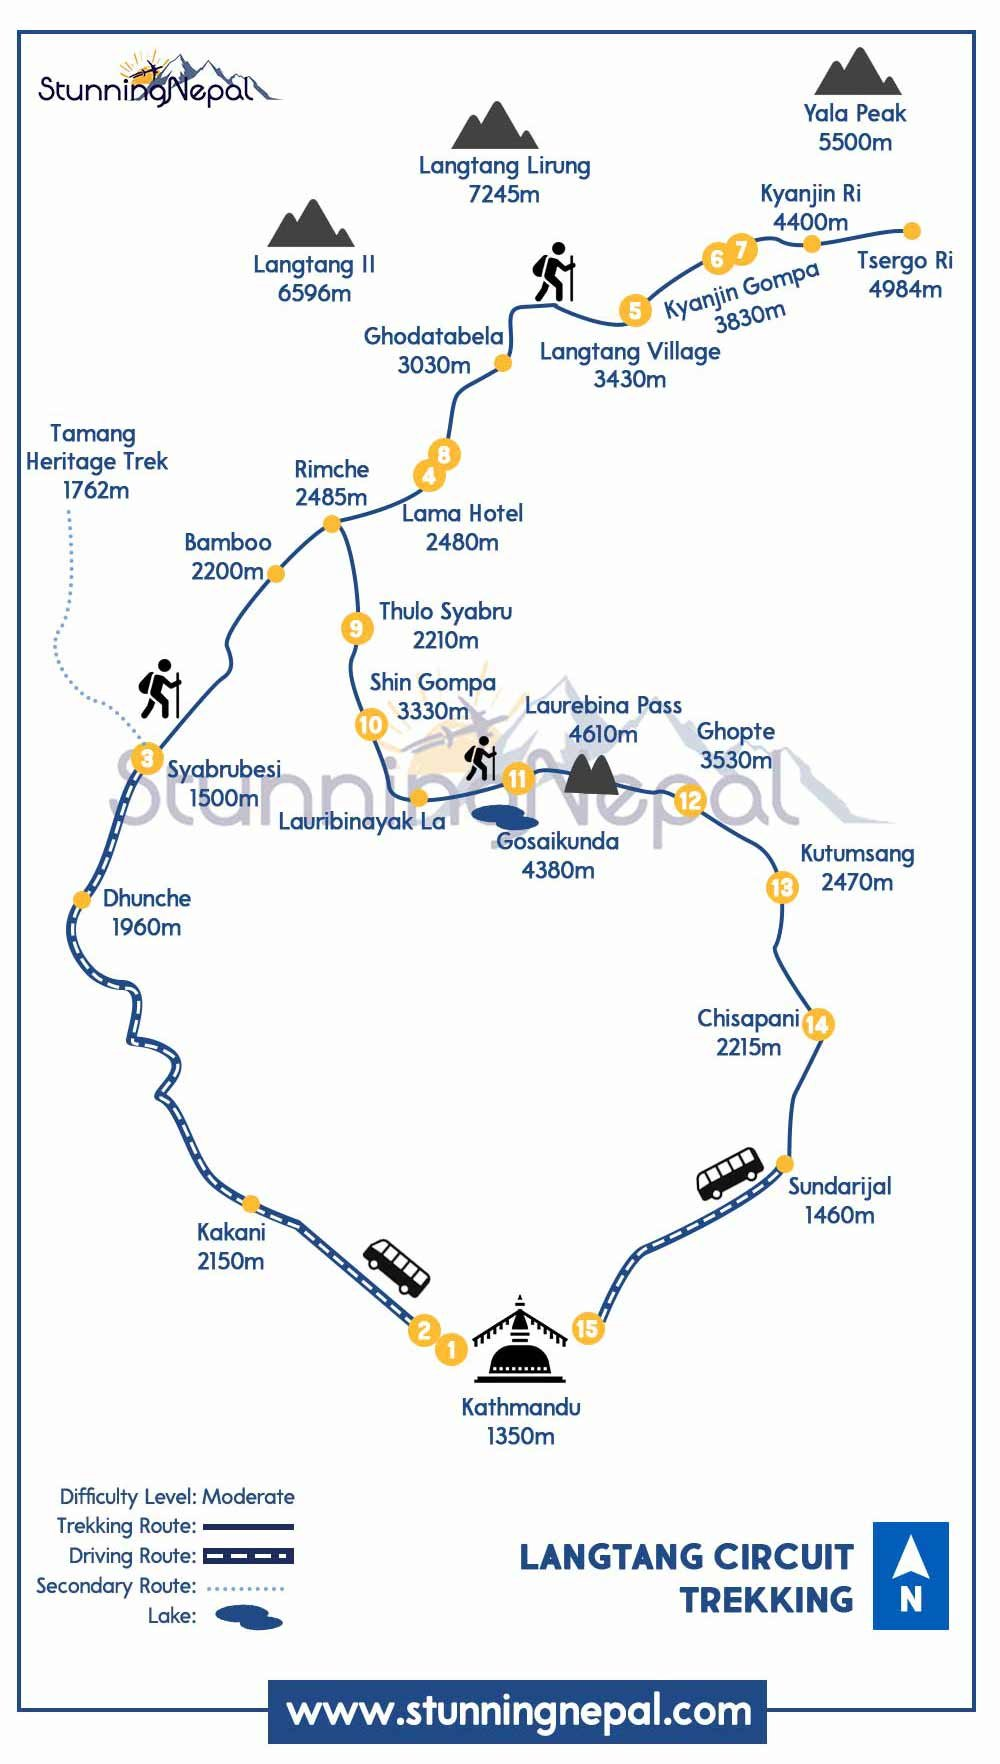 Langtang Circuit Trekking Route Map